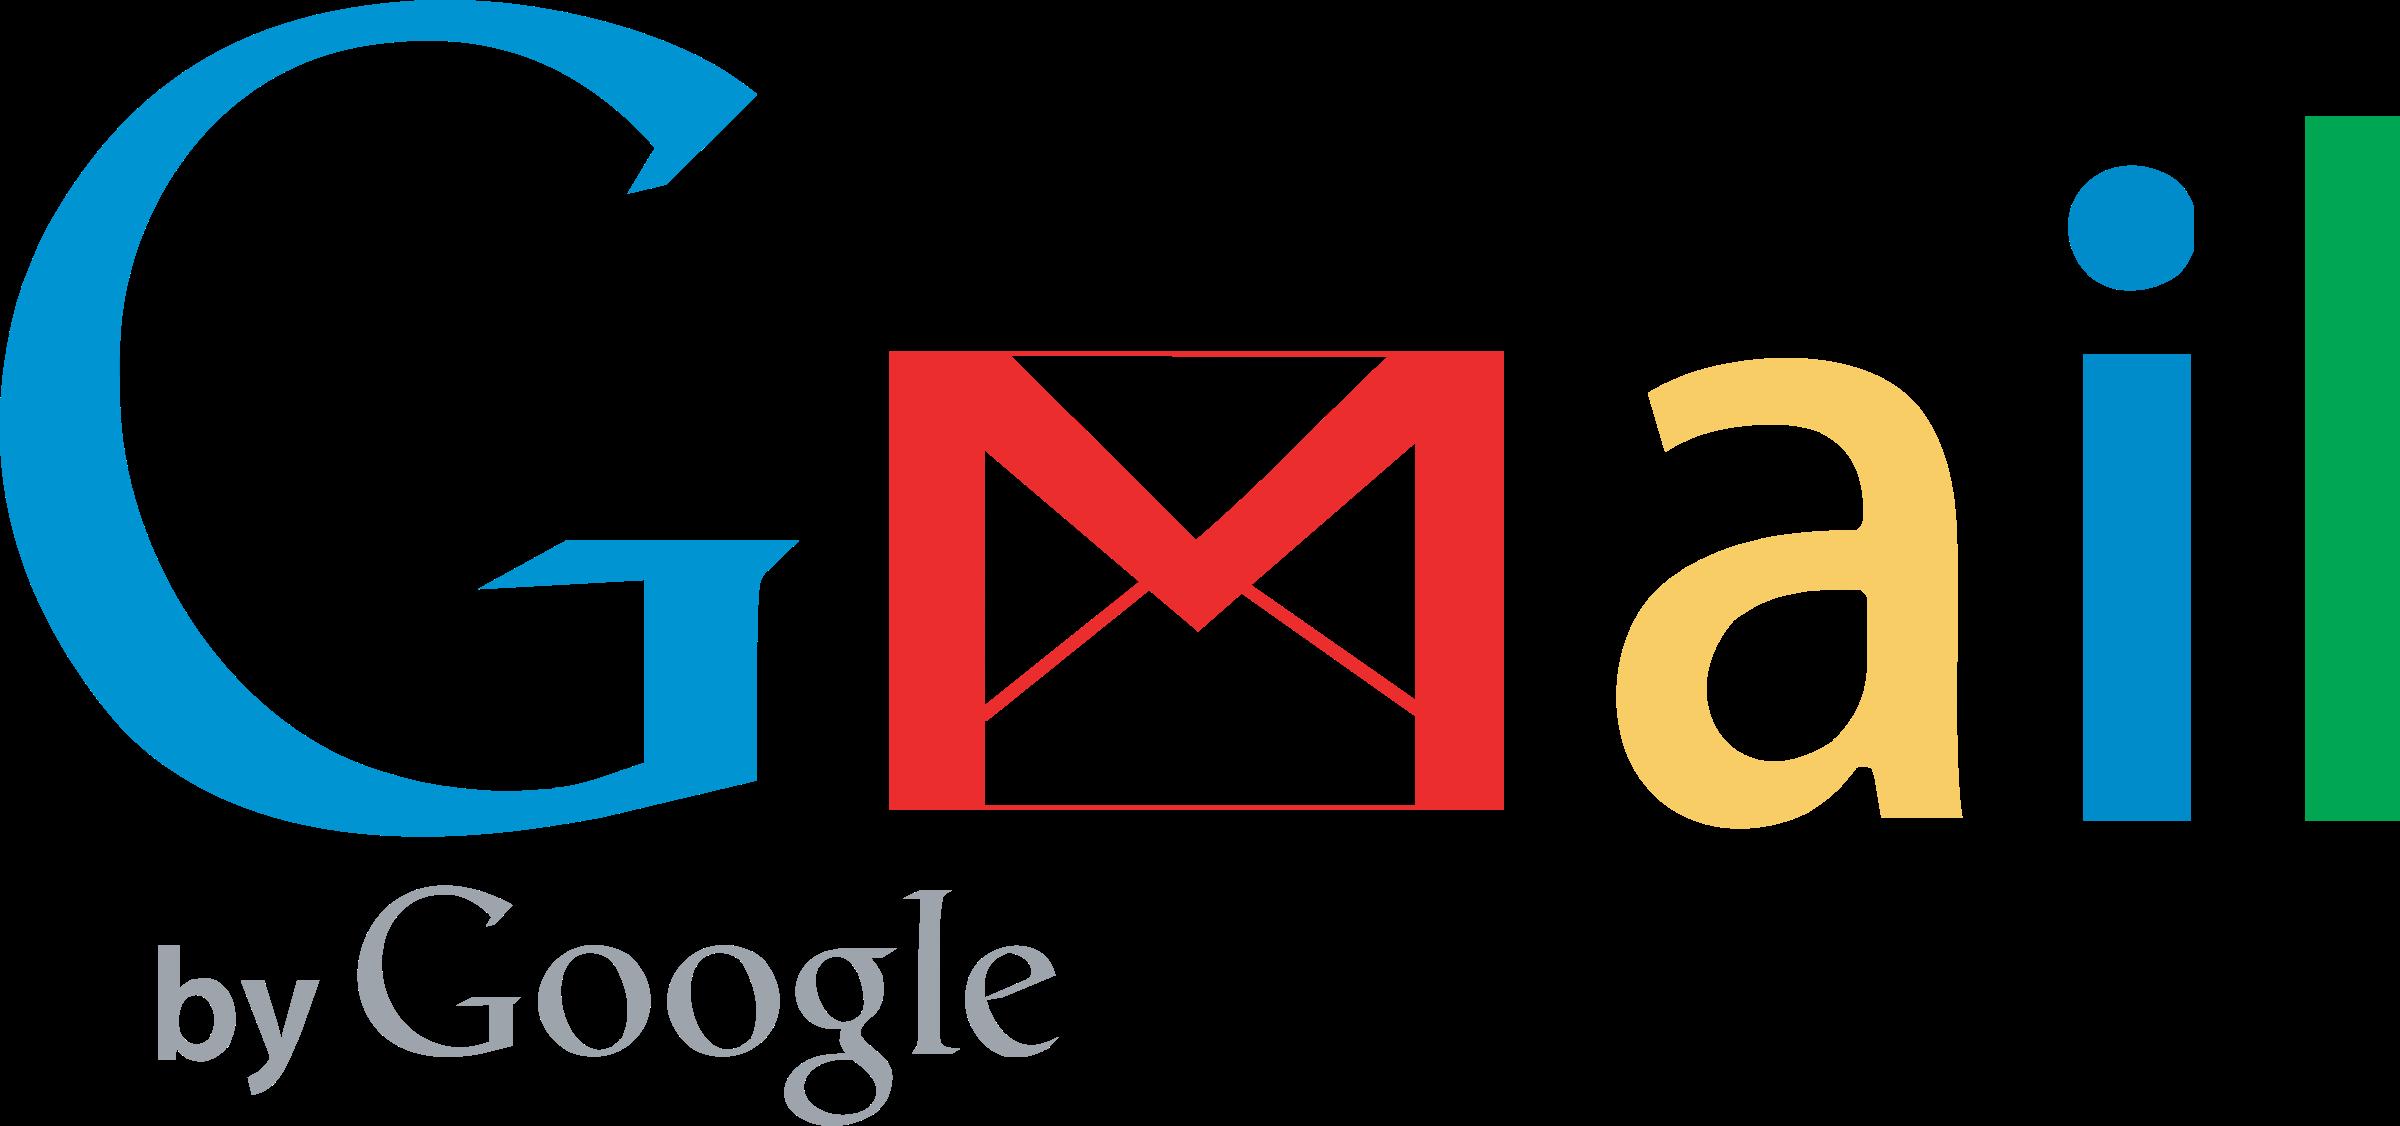 Gmail Logo PNG Transparent  SVG Vector  Freebie Supply